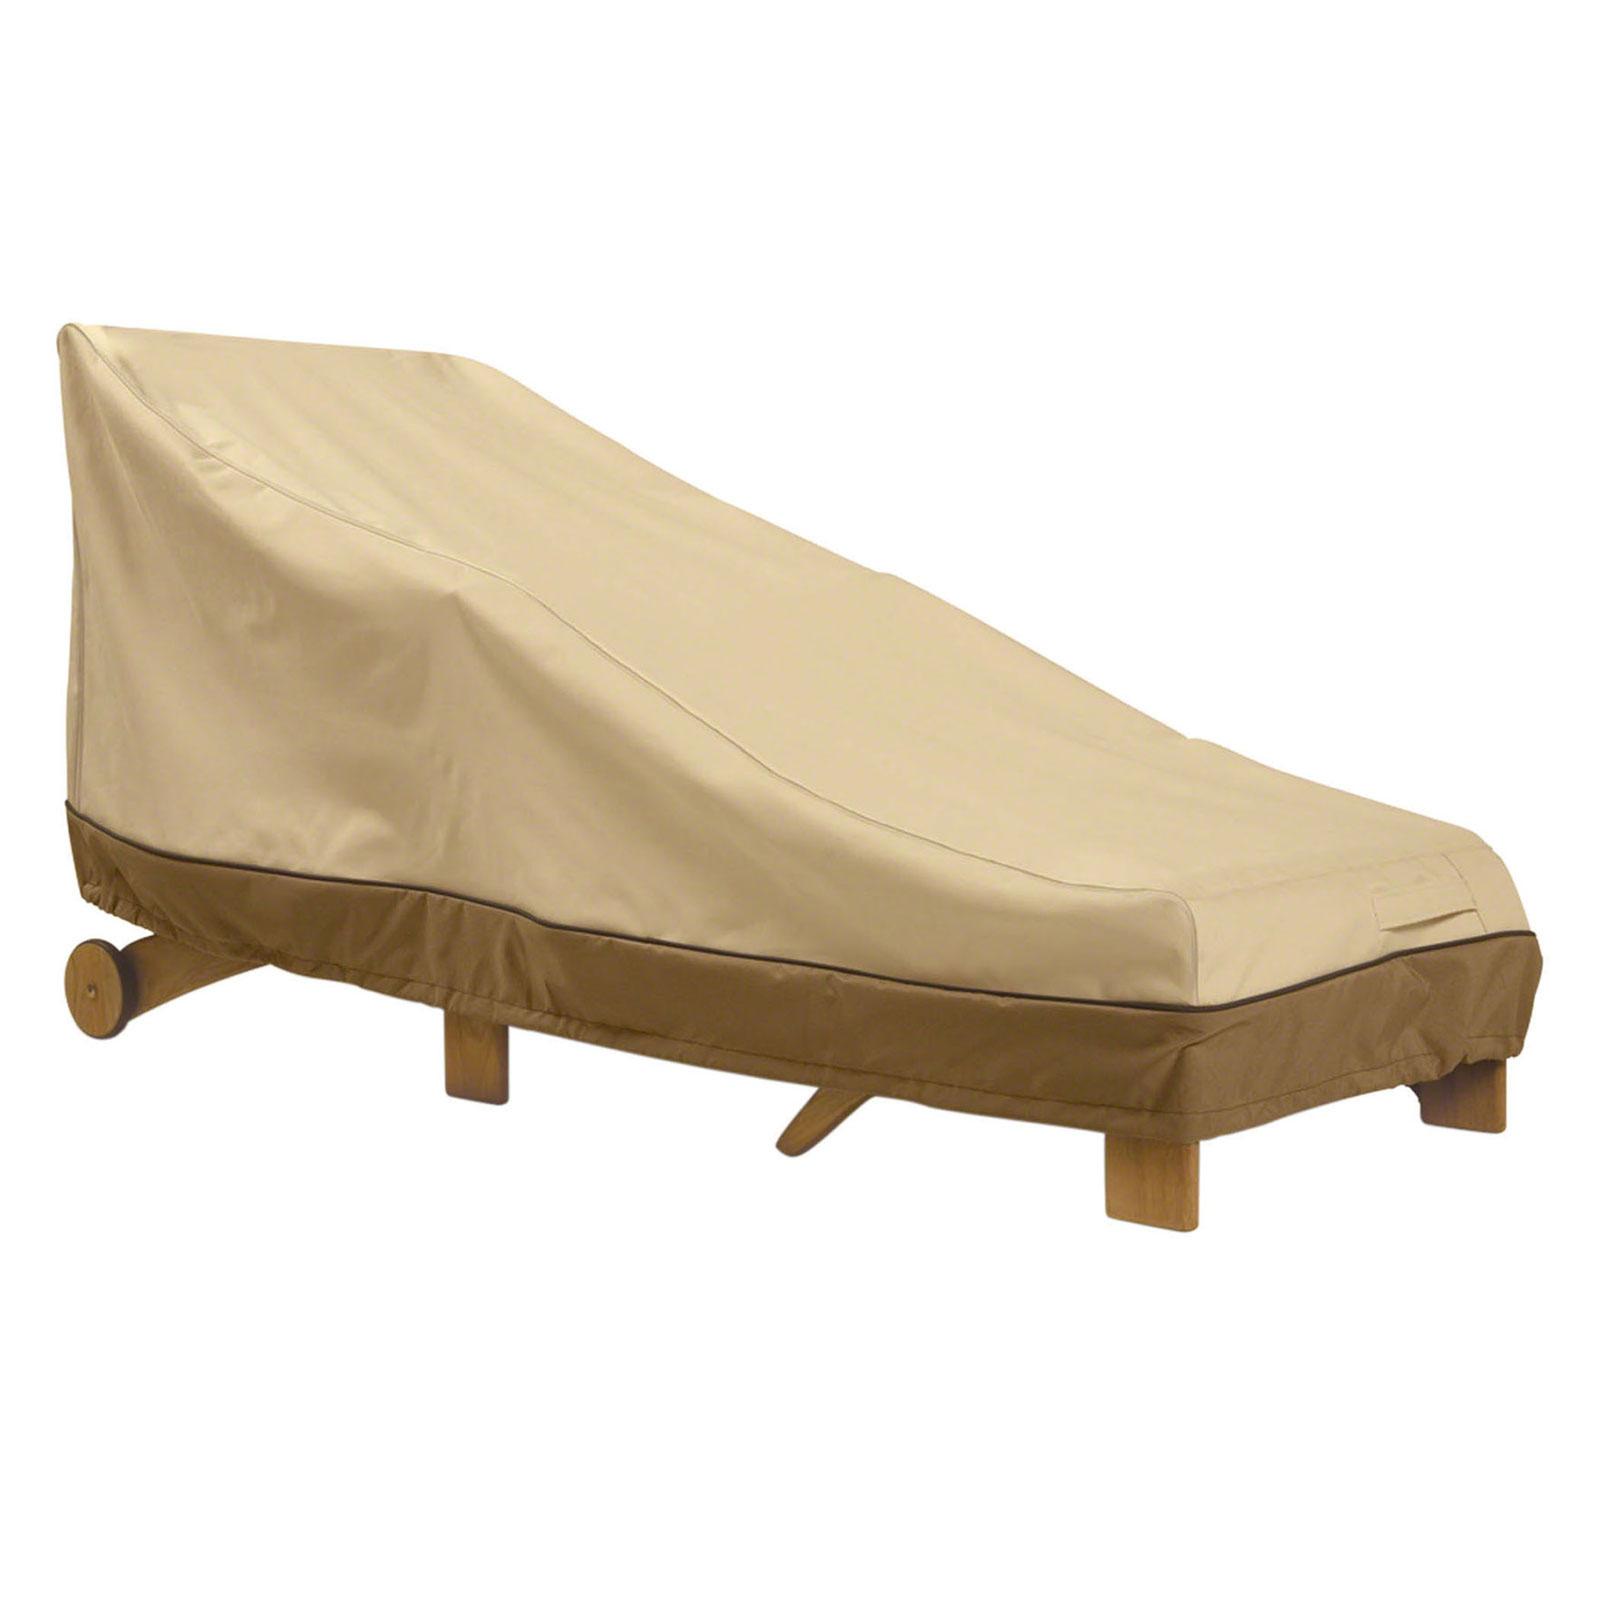 Chaise Lounge Cover - Veranda in Patio Furniture Covers